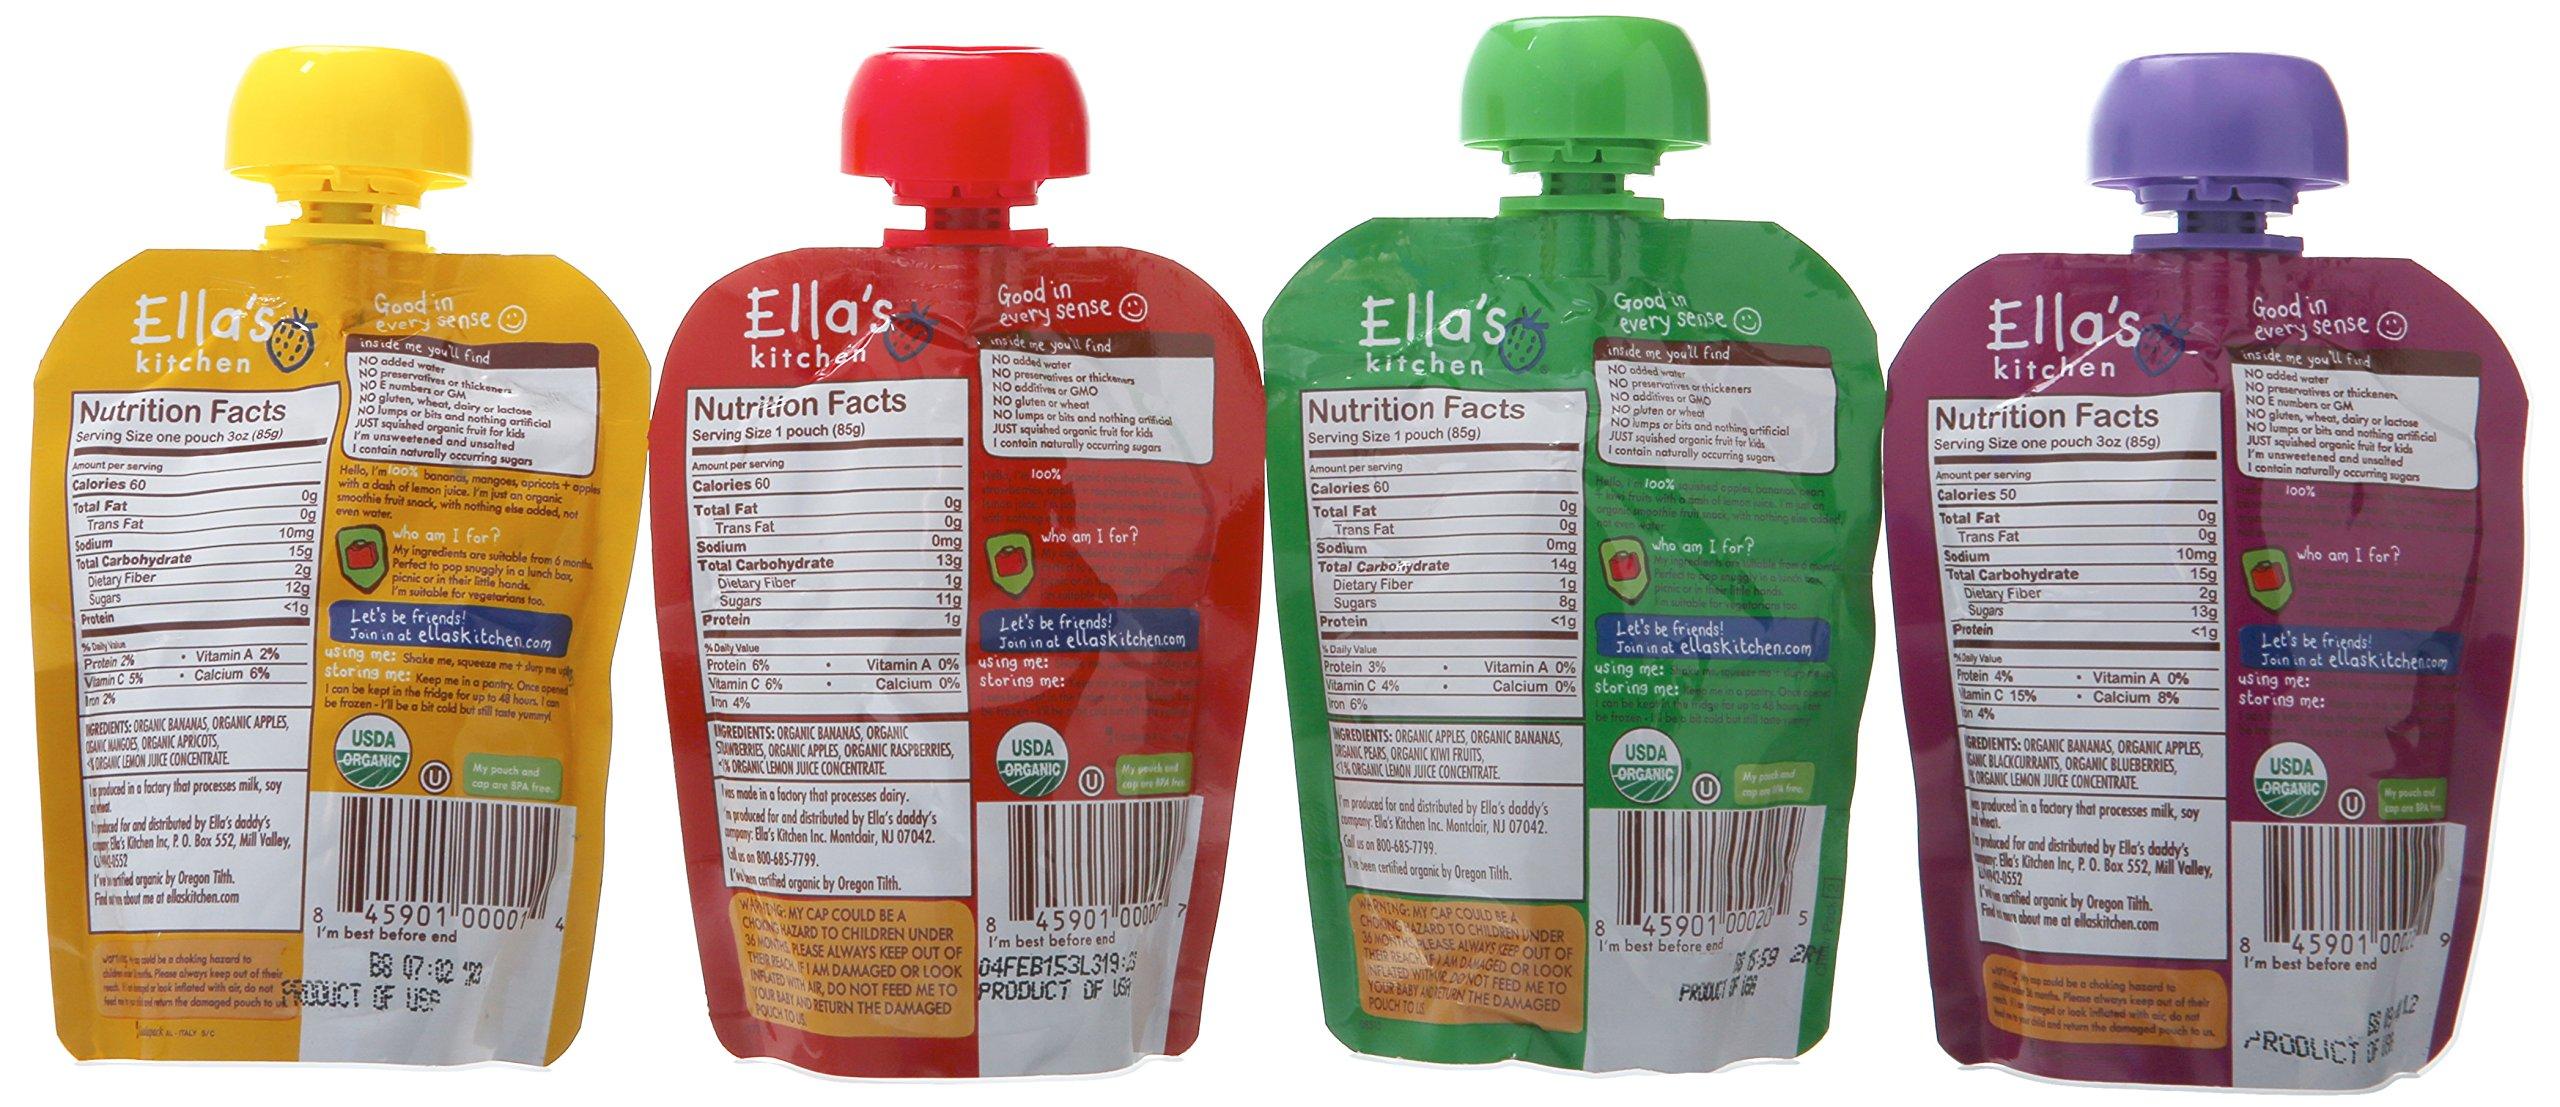 Ella's Kitchen Organic Smoothie Fruits 4 Flavor Variety Pack (8 Total Pouches) by Ella's Kitchen (Image #4)